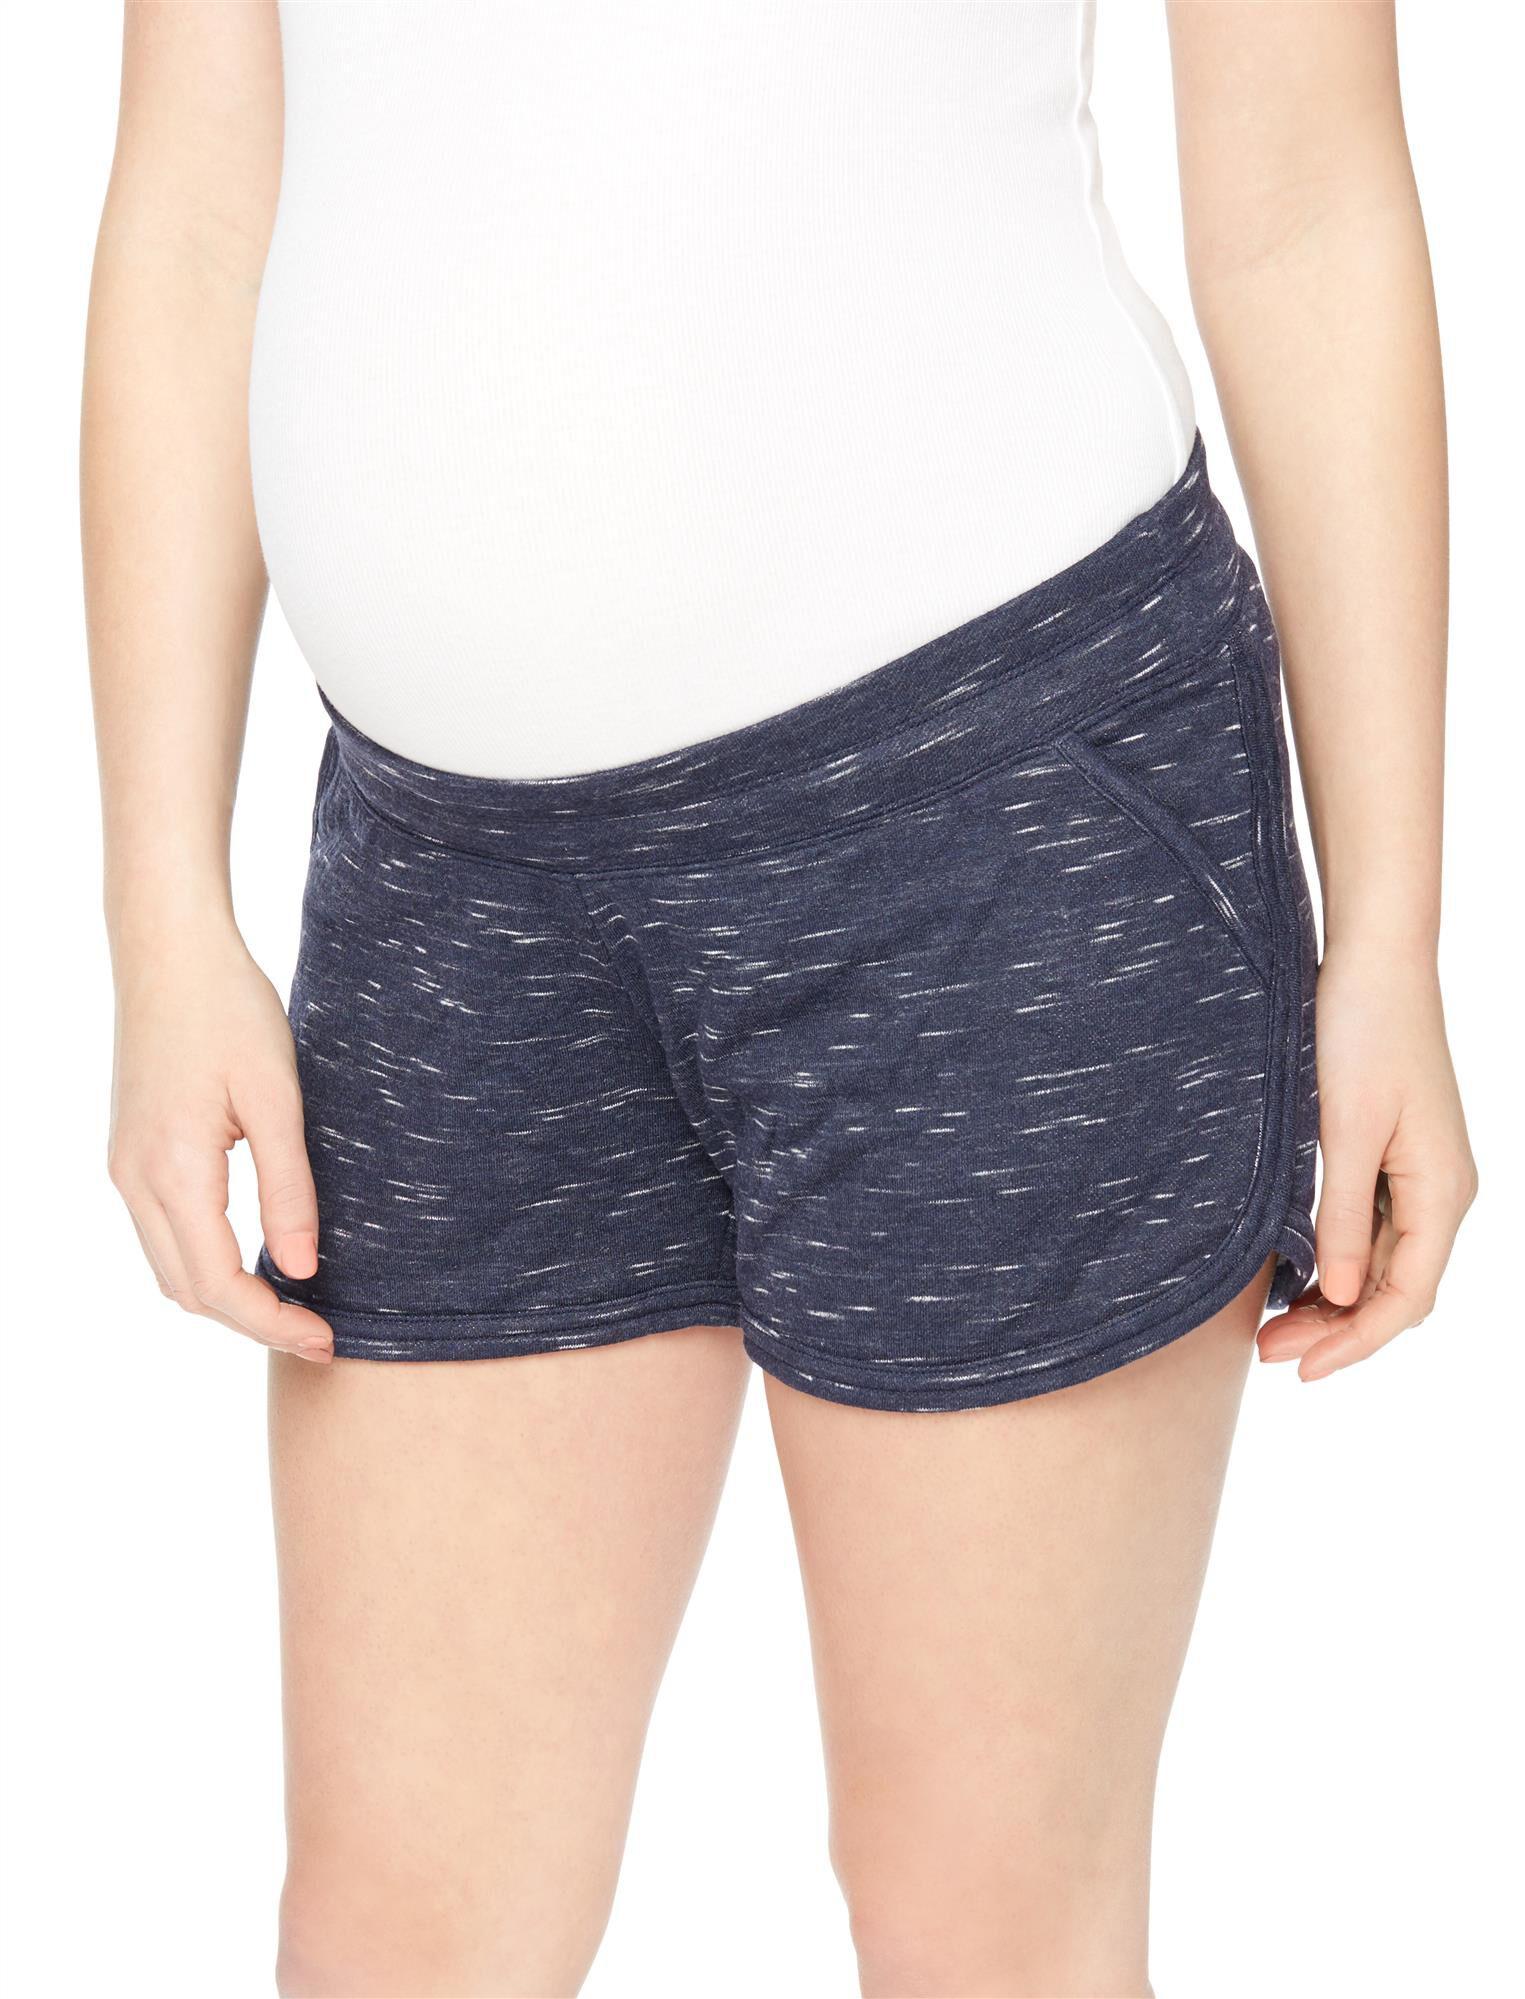 Under Belly Spacedye Maternity Shorts